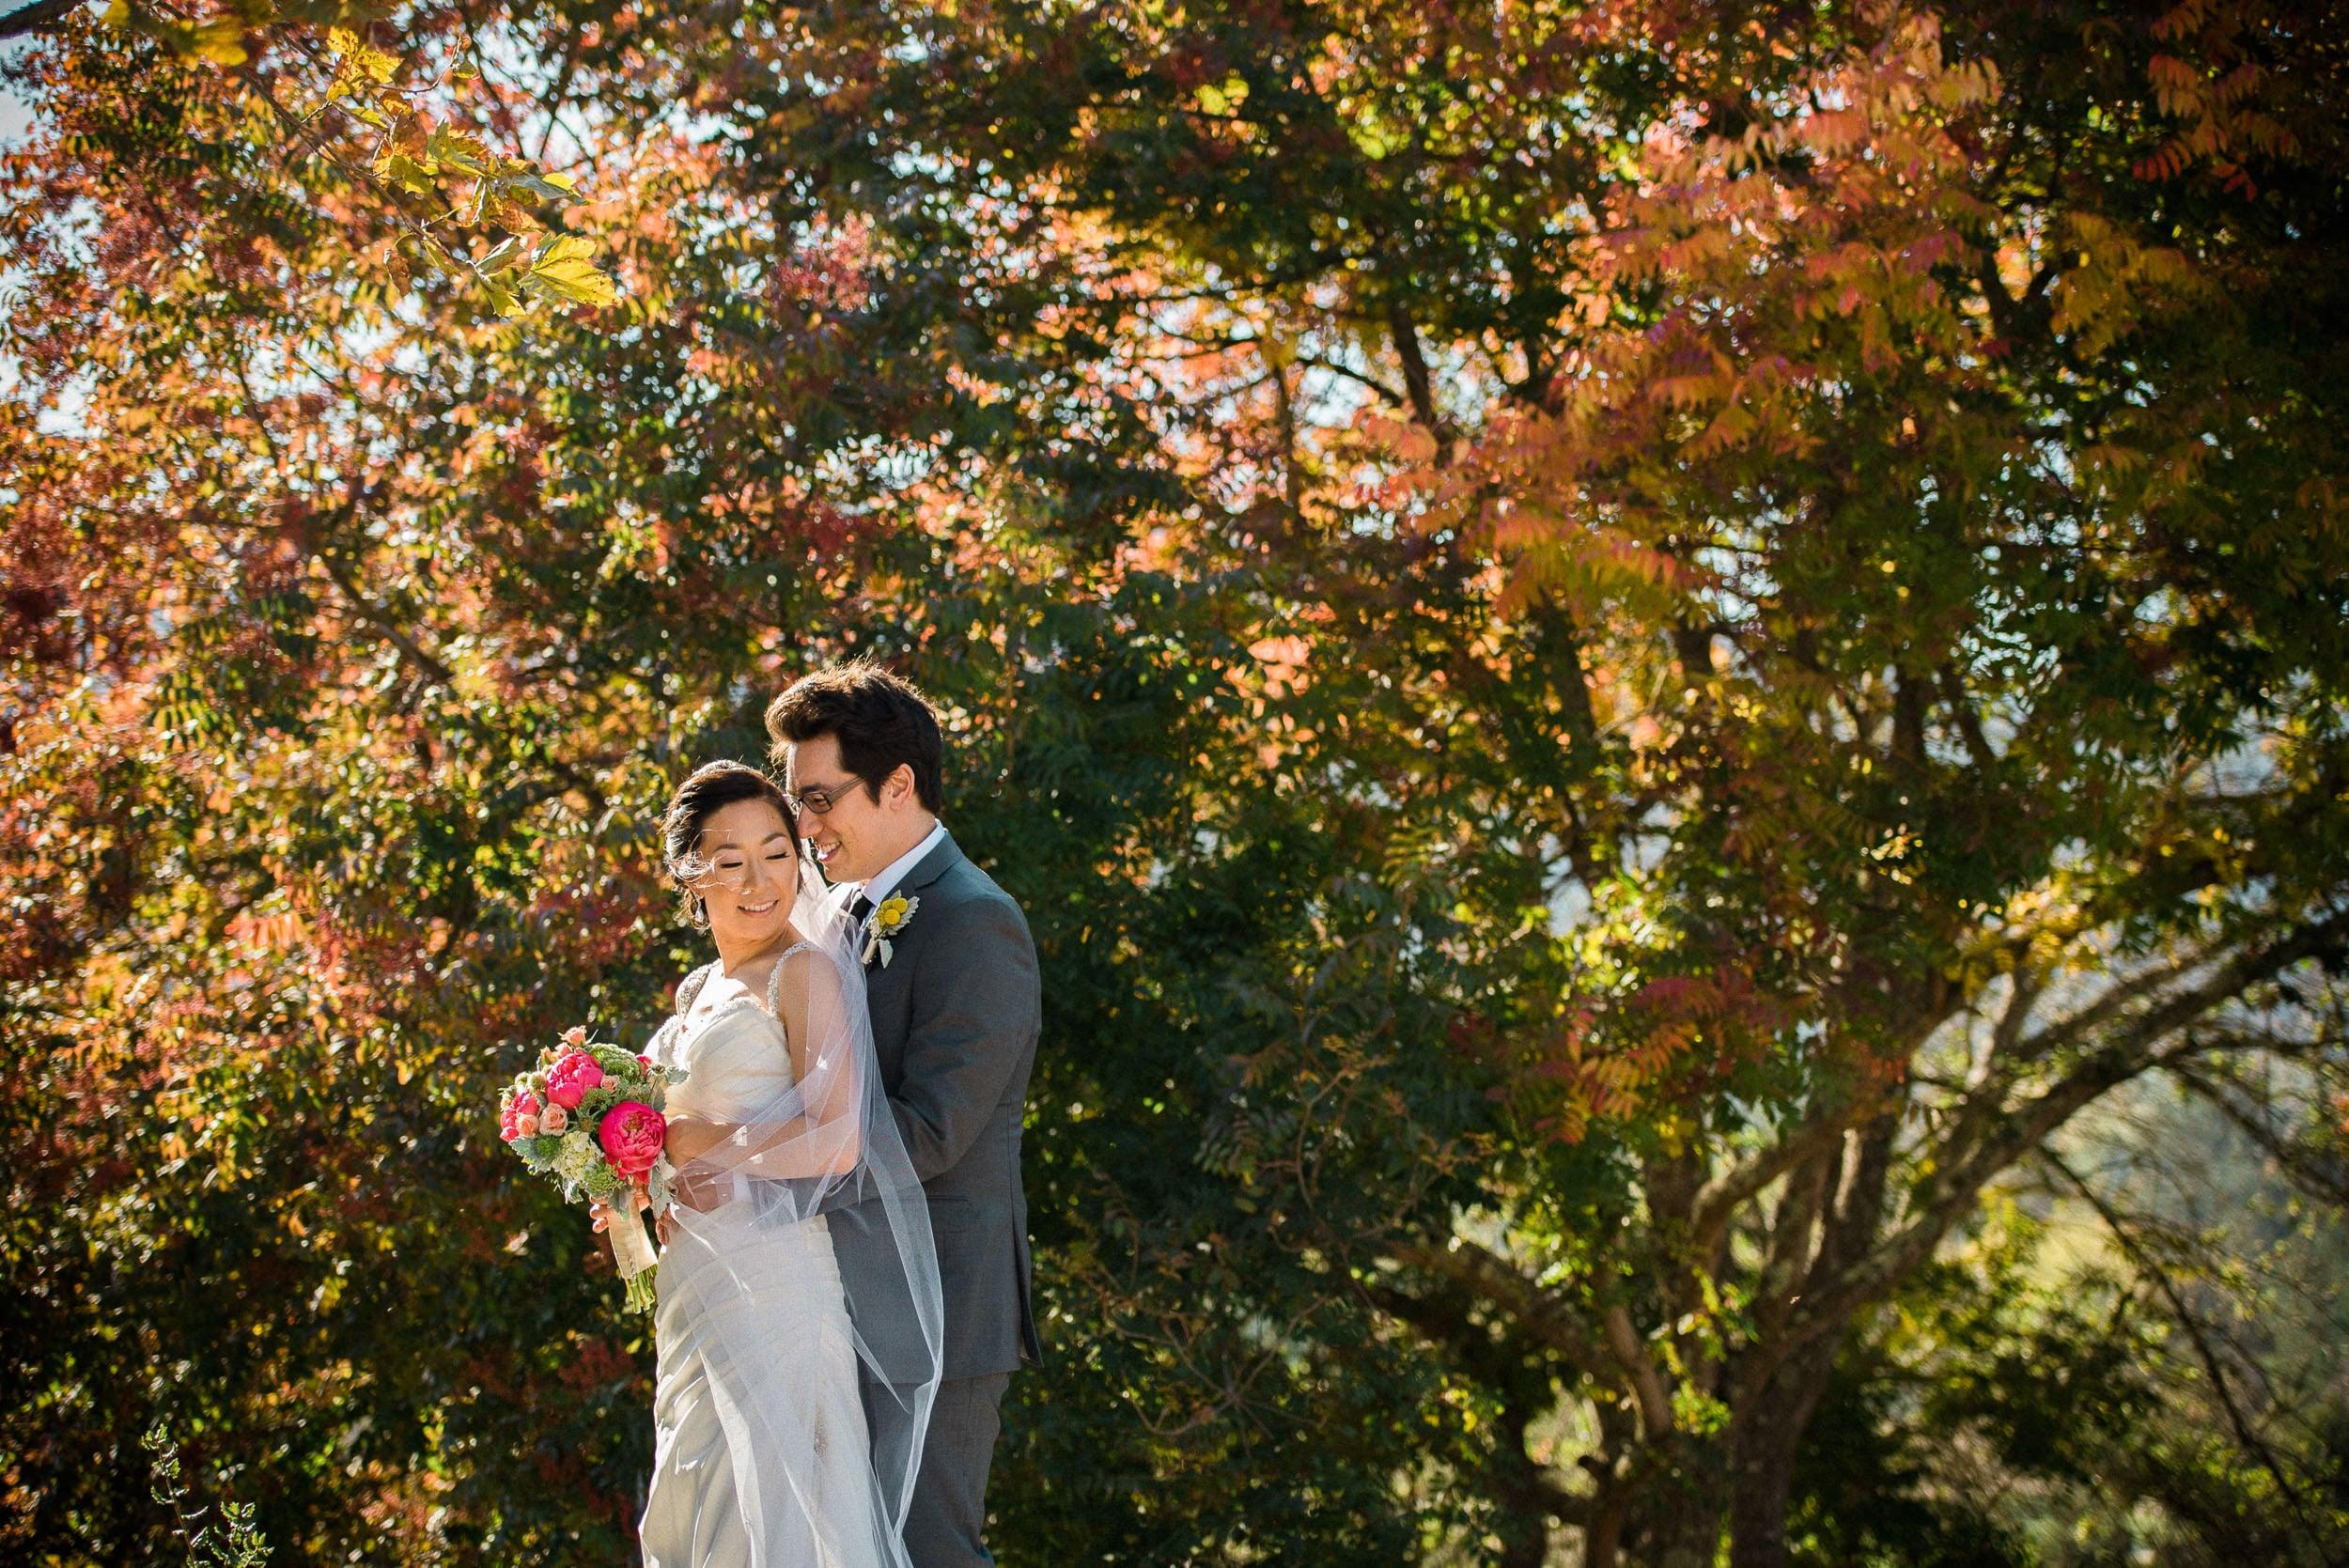 Moraga Valley Church wedding 019.jpg